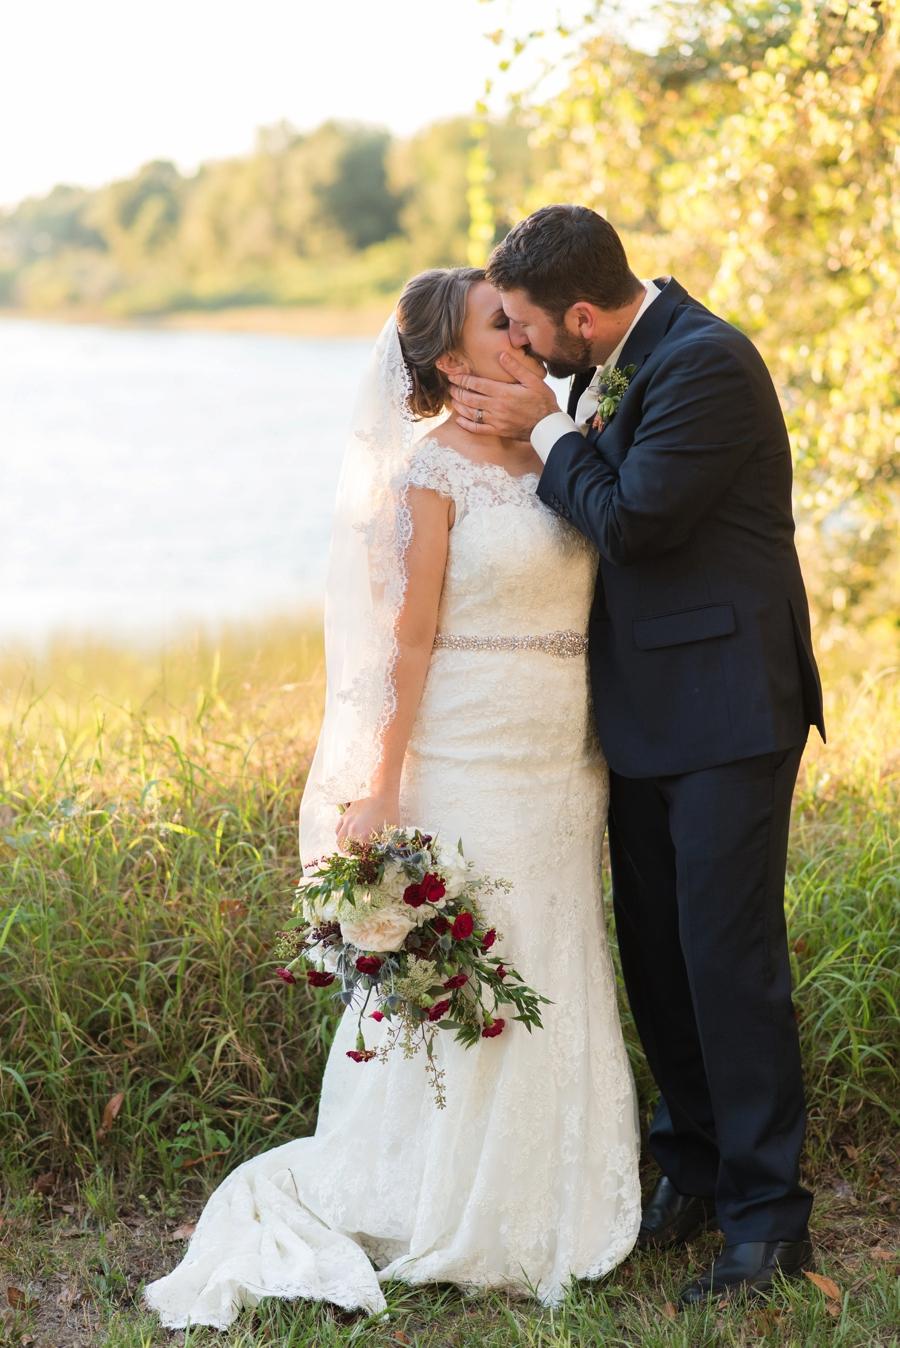 A Navy & Red Rustic Central Florida Wedding via TheELD.com